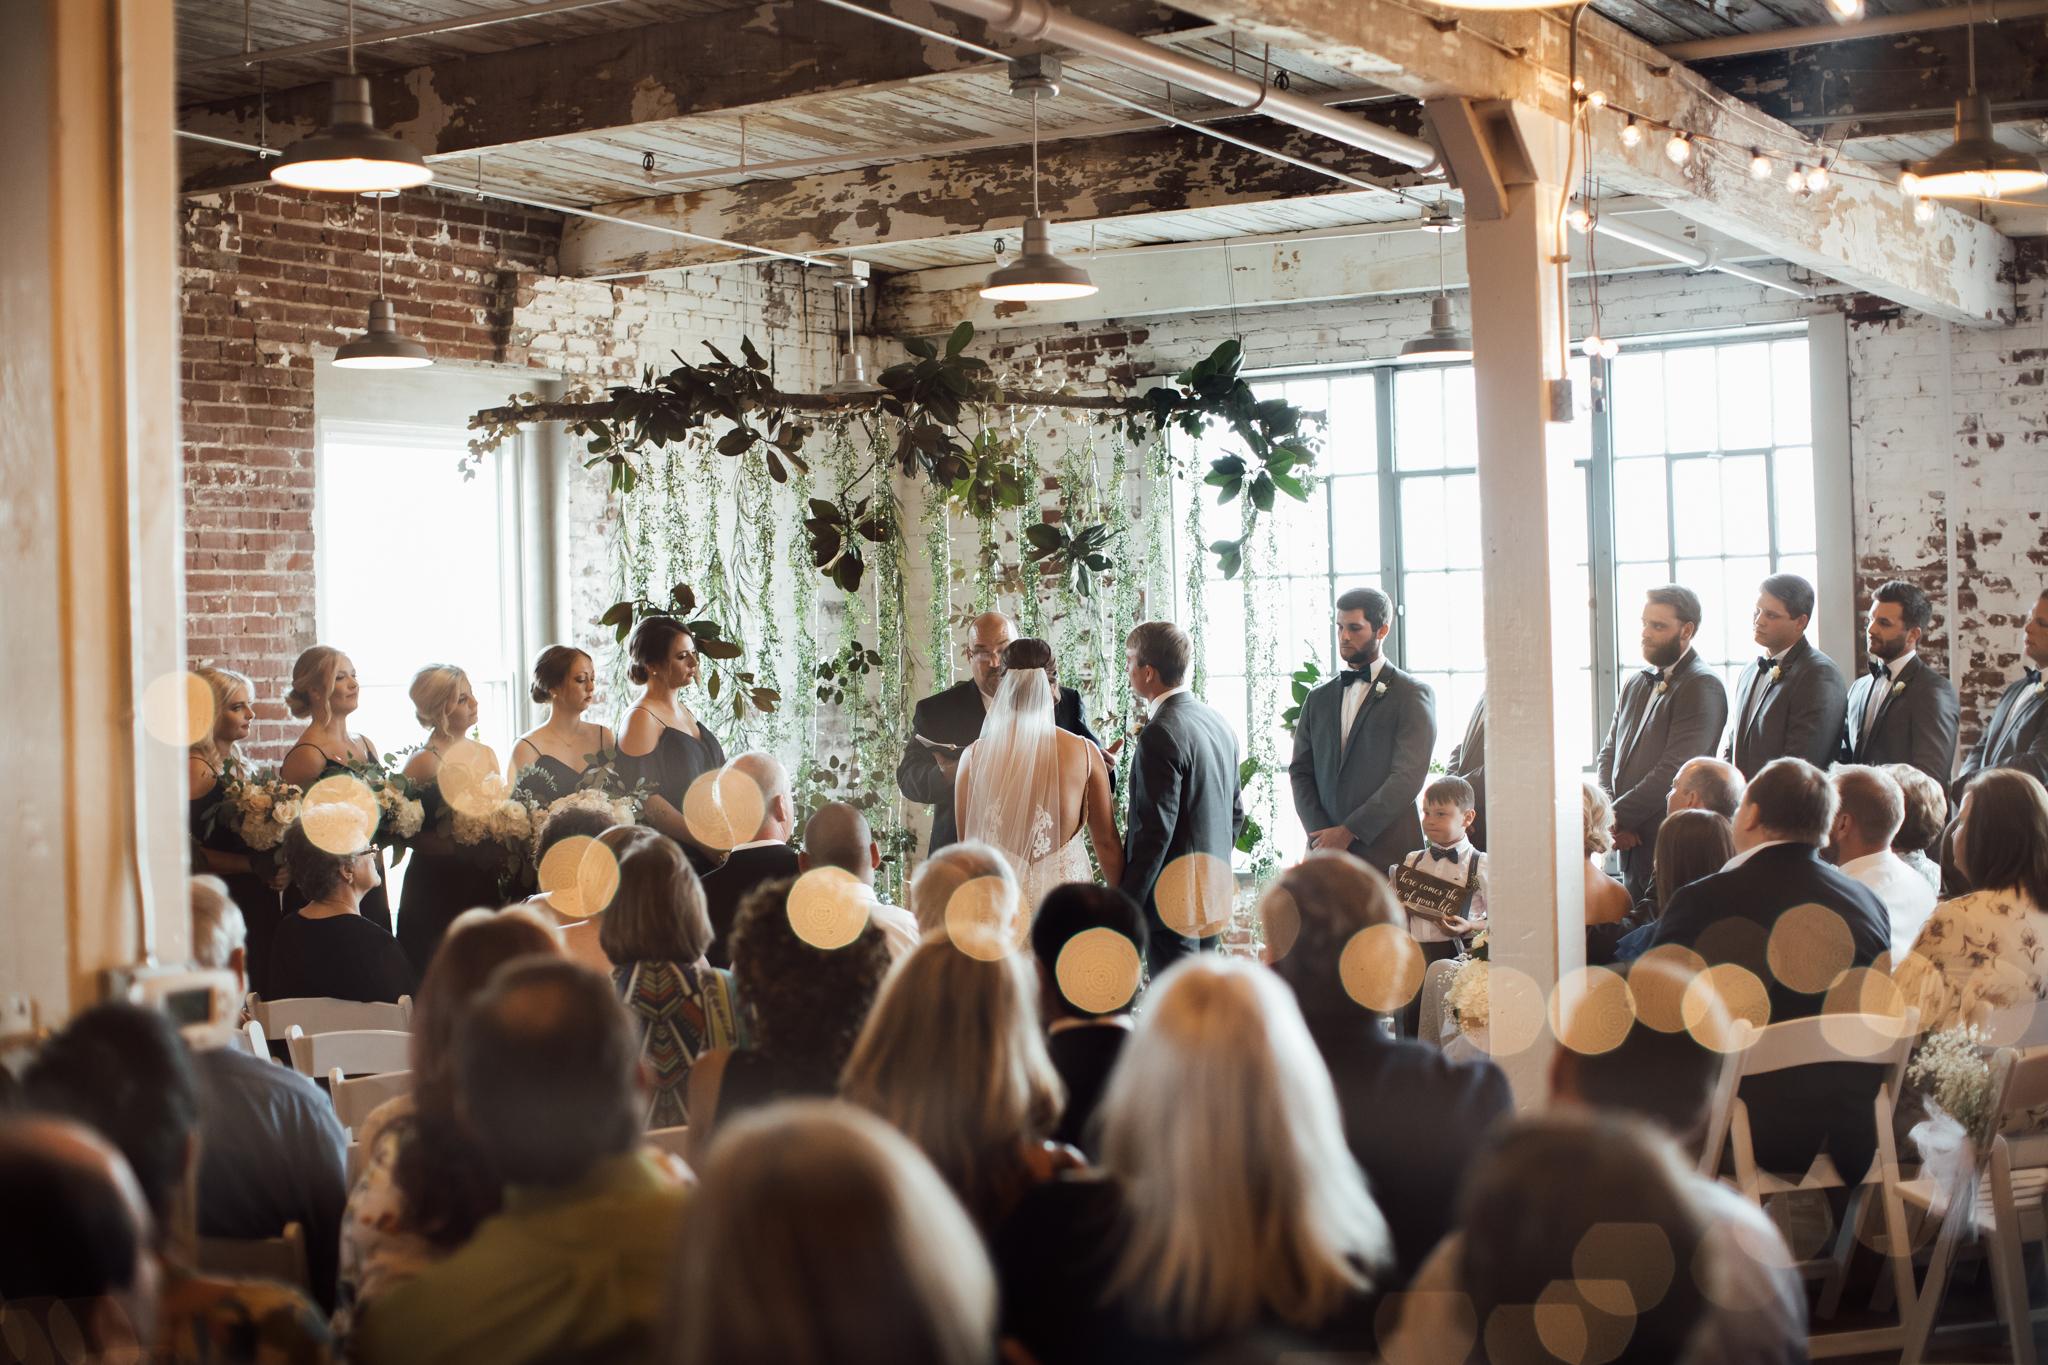 409smain-downtown-memphis-wedding-venue-thewarmtharoundyou (95 of 243).jpg